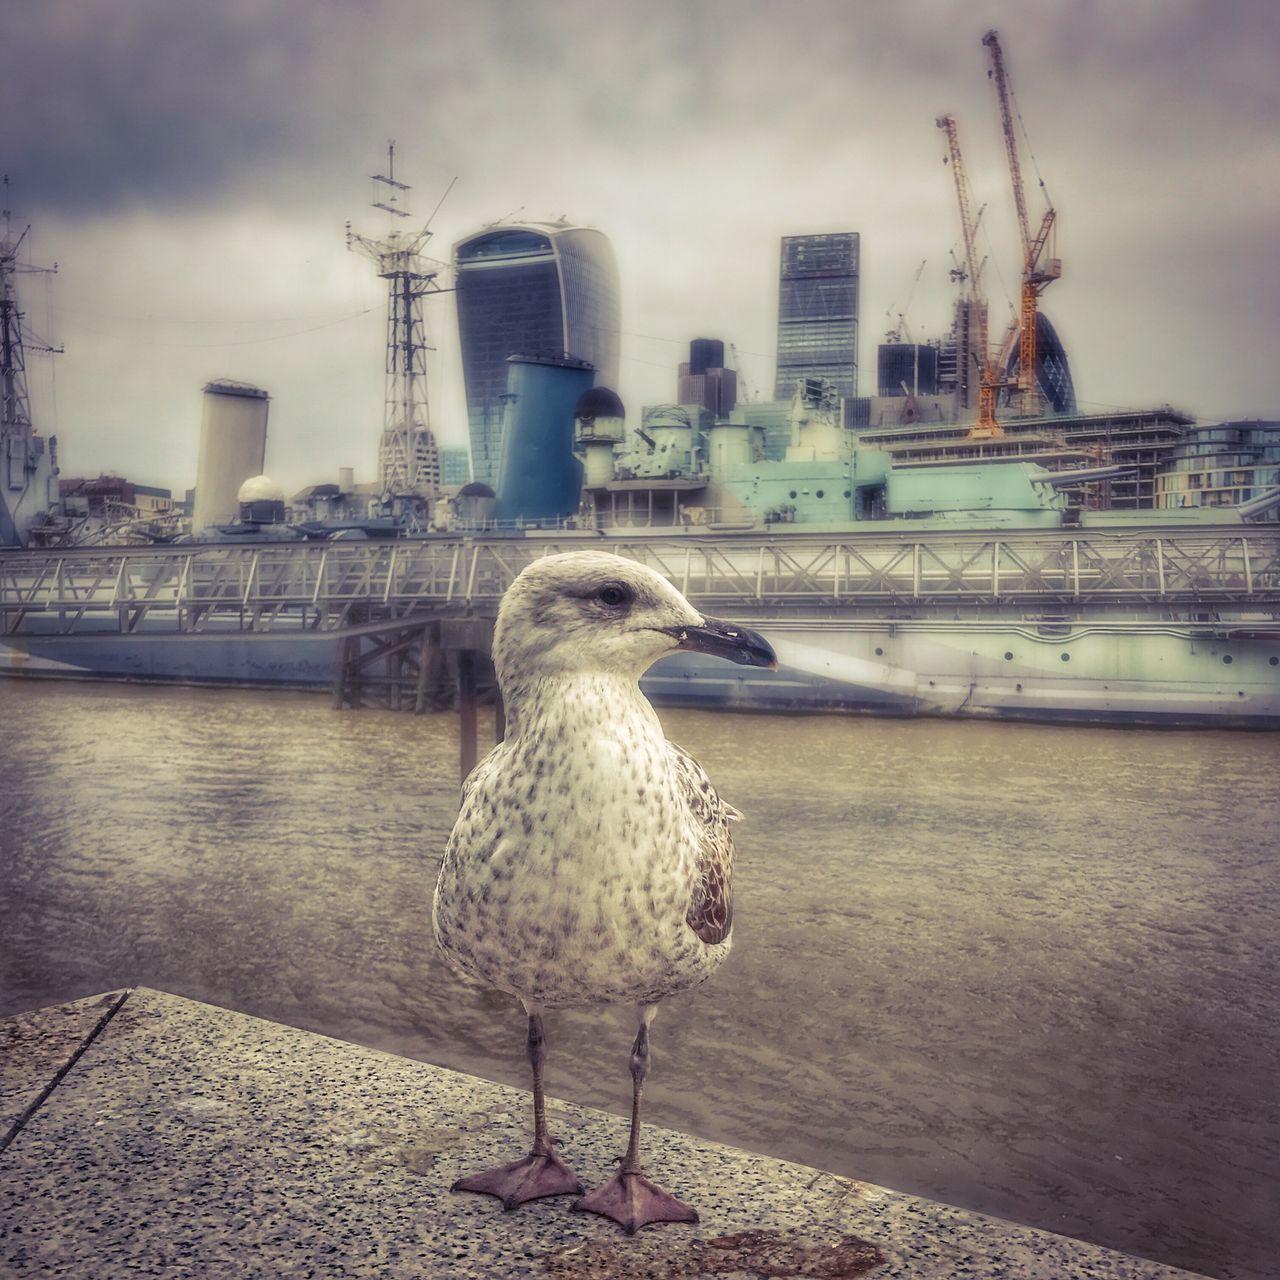 Bird Animal Themes One Animal Seagull River Animal Portrait Bird Photography Bird Portait London Southbank London